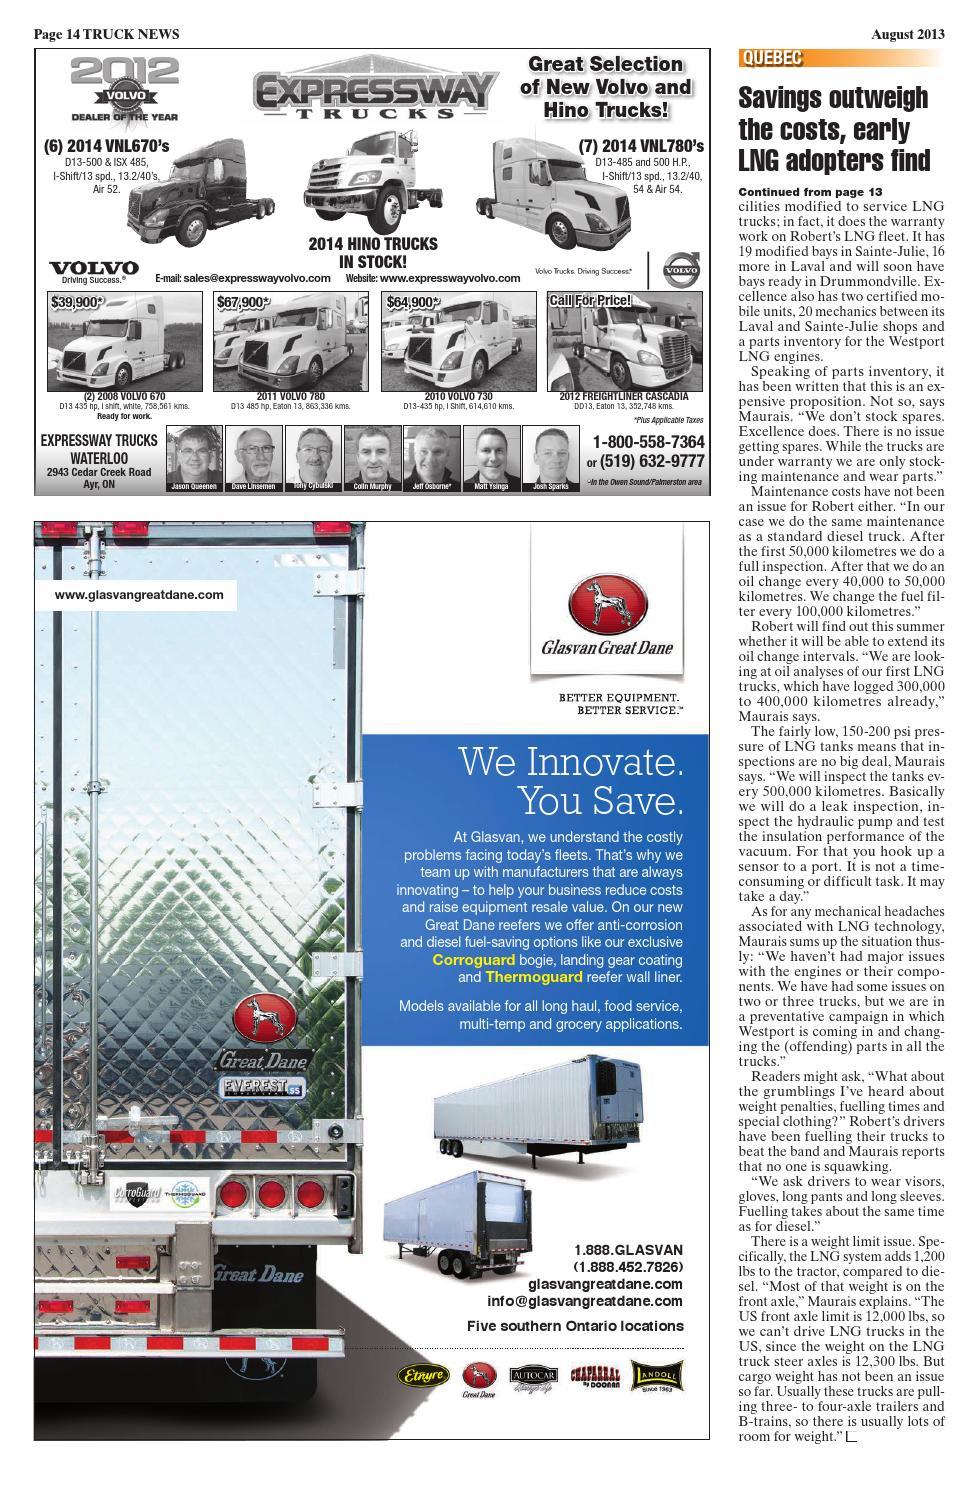 Truck News August 2013 by Annex Business Media - issuu